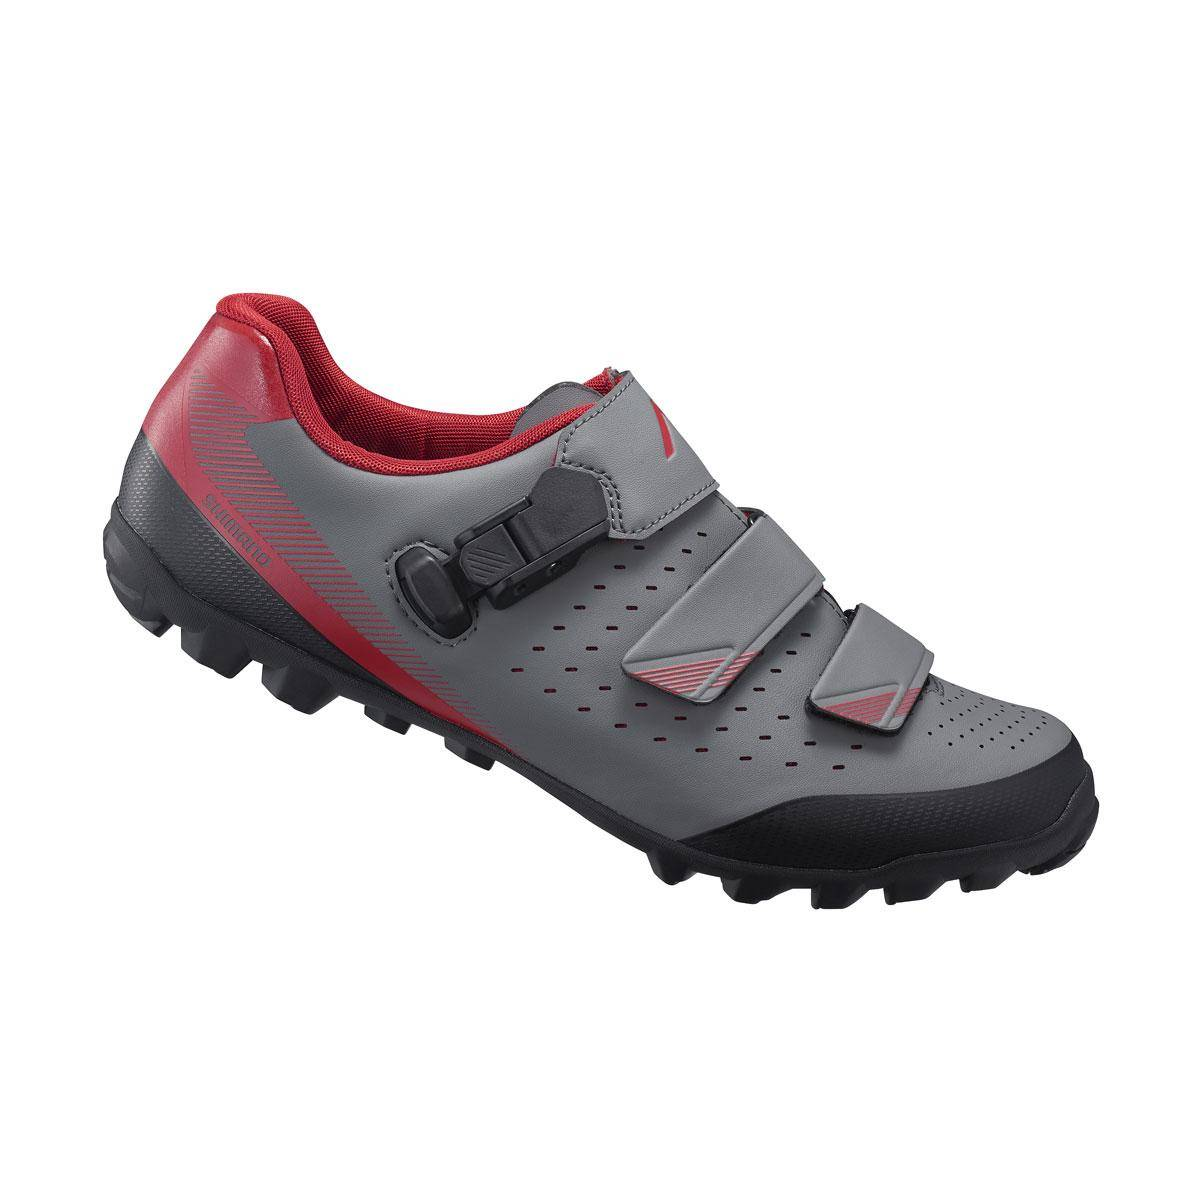 SHIMANO MTB obuv SH-ME301MG43, šedá, 43